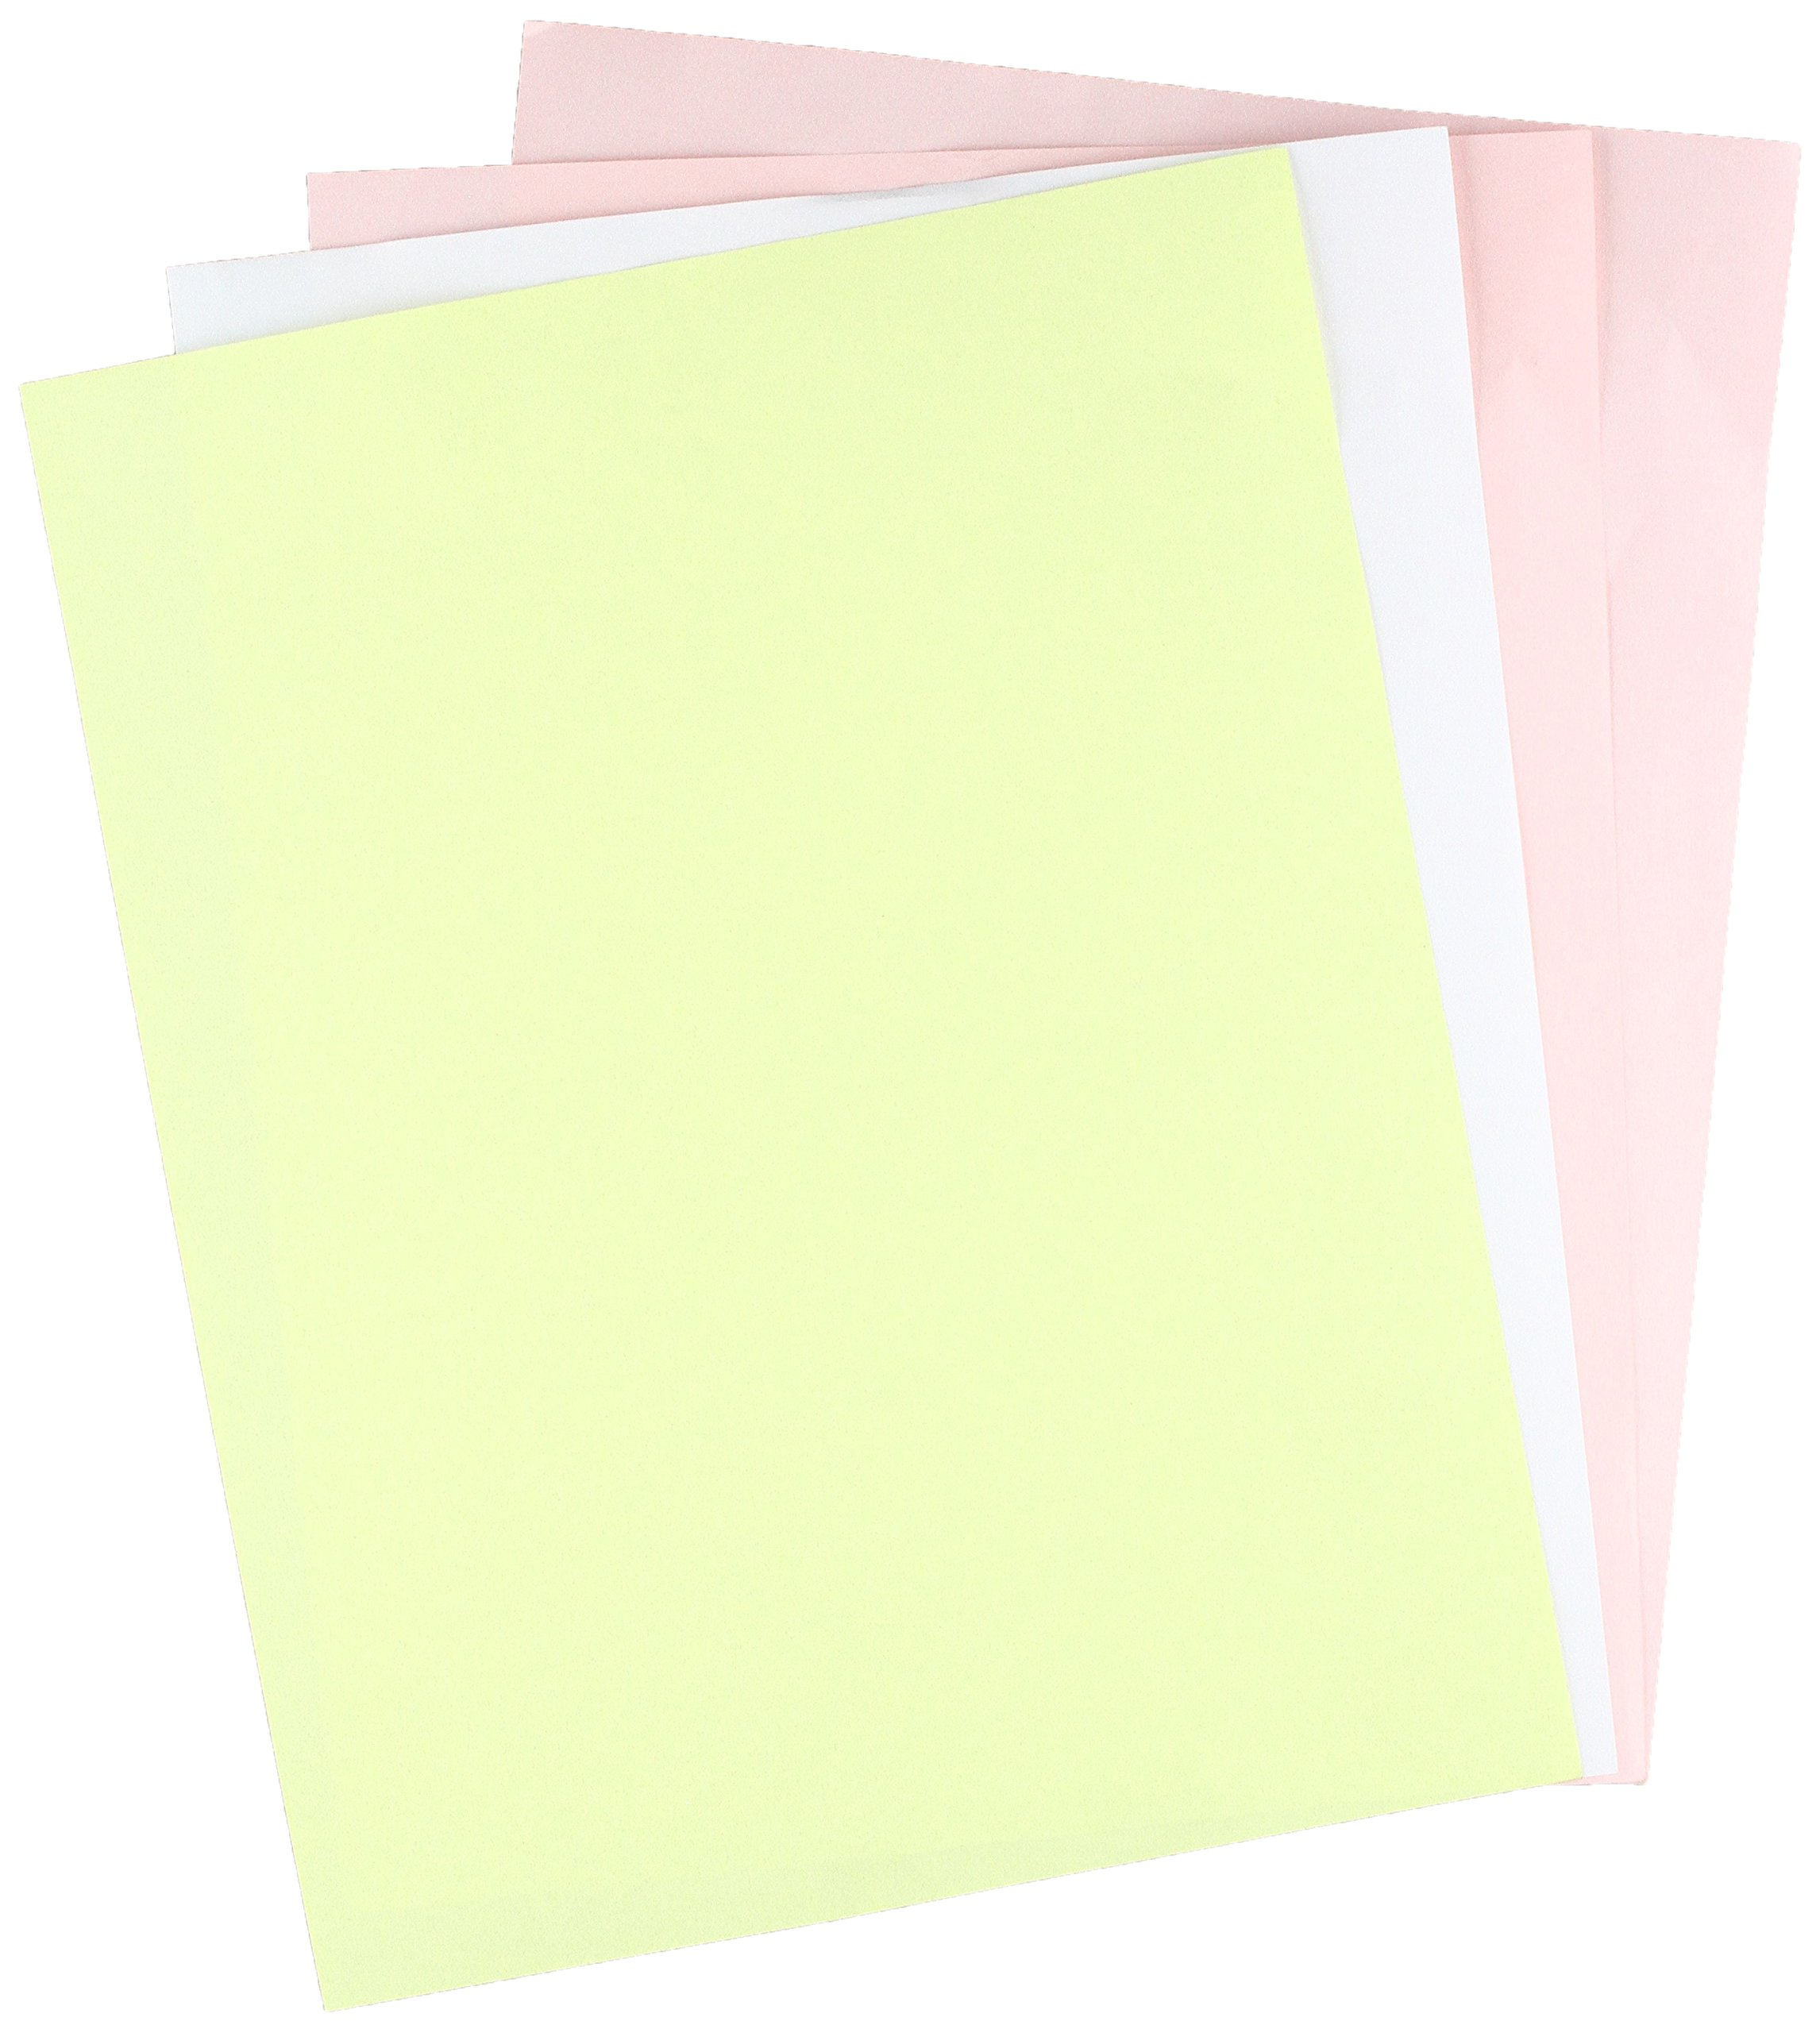 Appvion NCR Paper 3-Part Reverse Superior Carbonless Sheets (NCR5900)